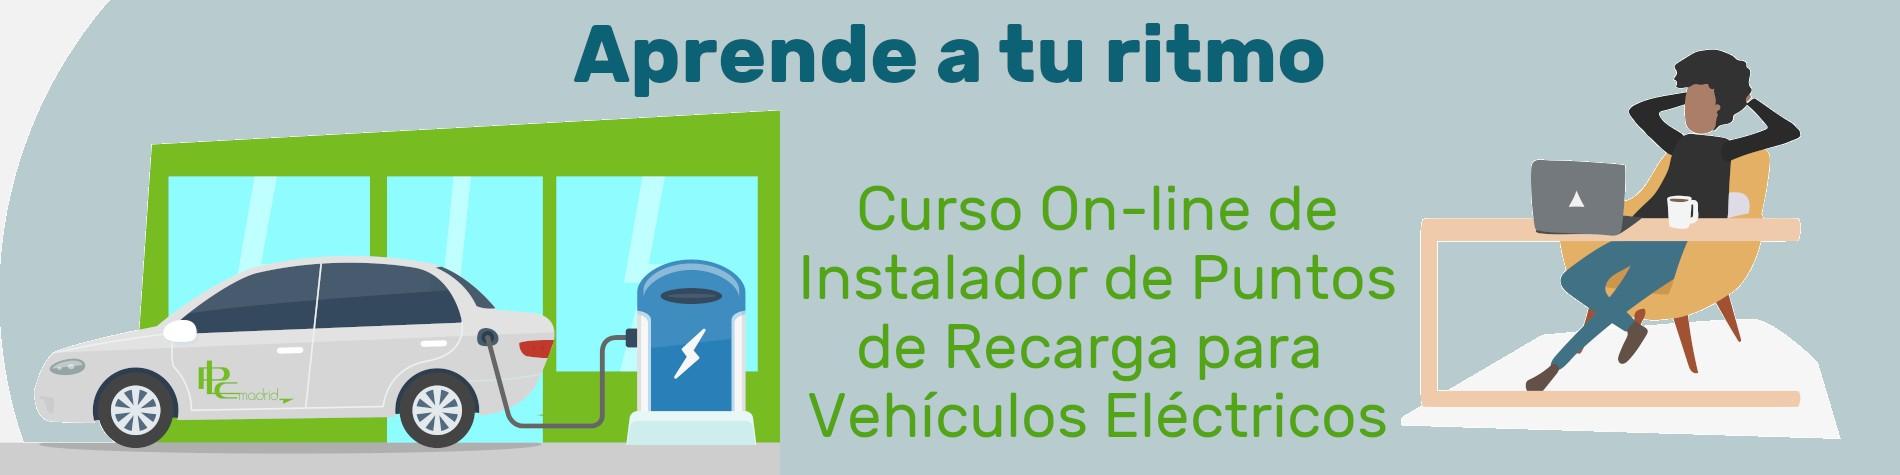 Curso instalador puntos de recarga para vehículo eléctrico